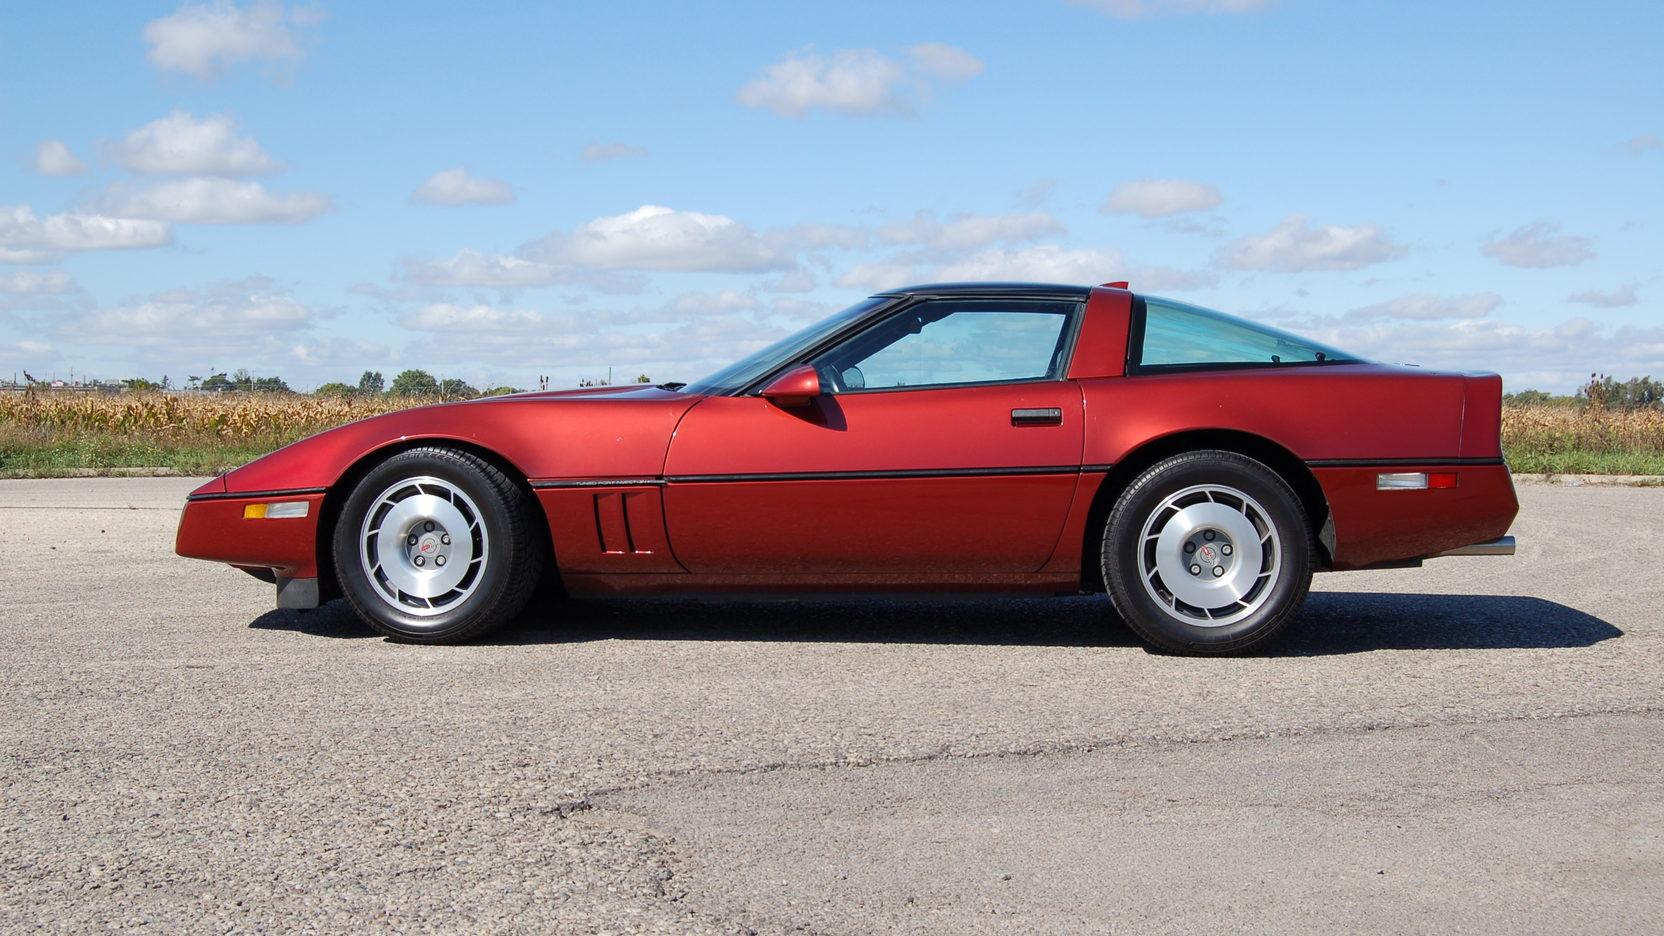 1987 Chevrolet Corvette side profile